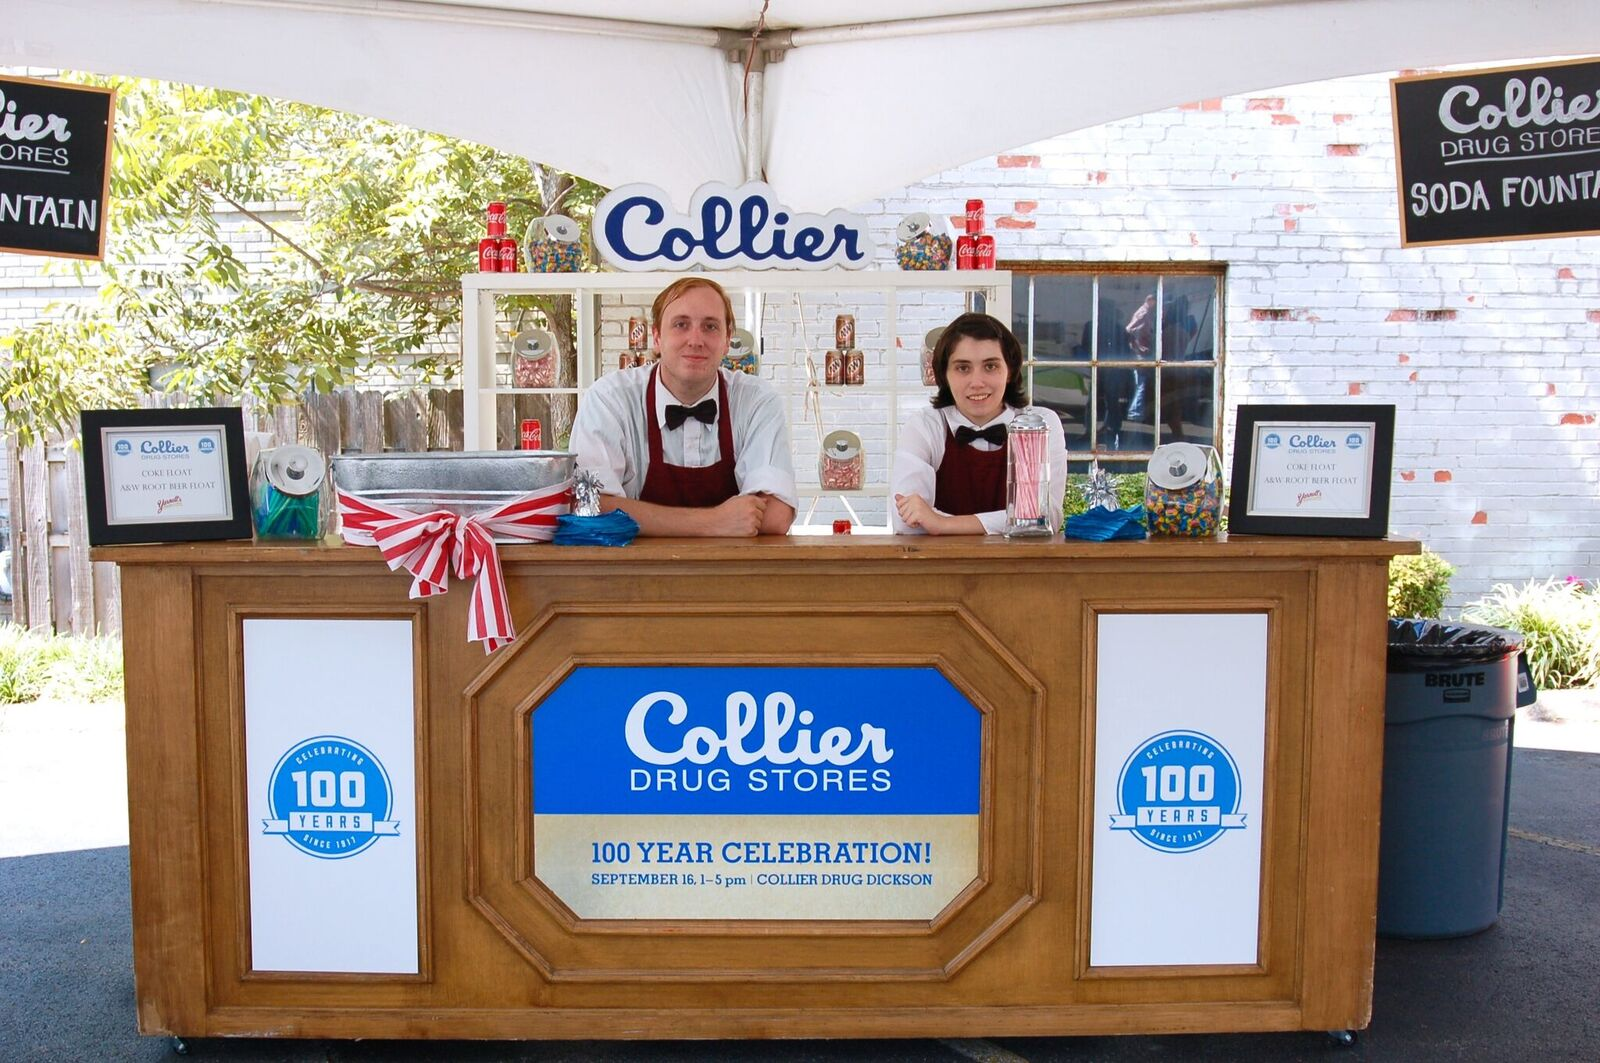 Collier Drug Store 100 Anniversary